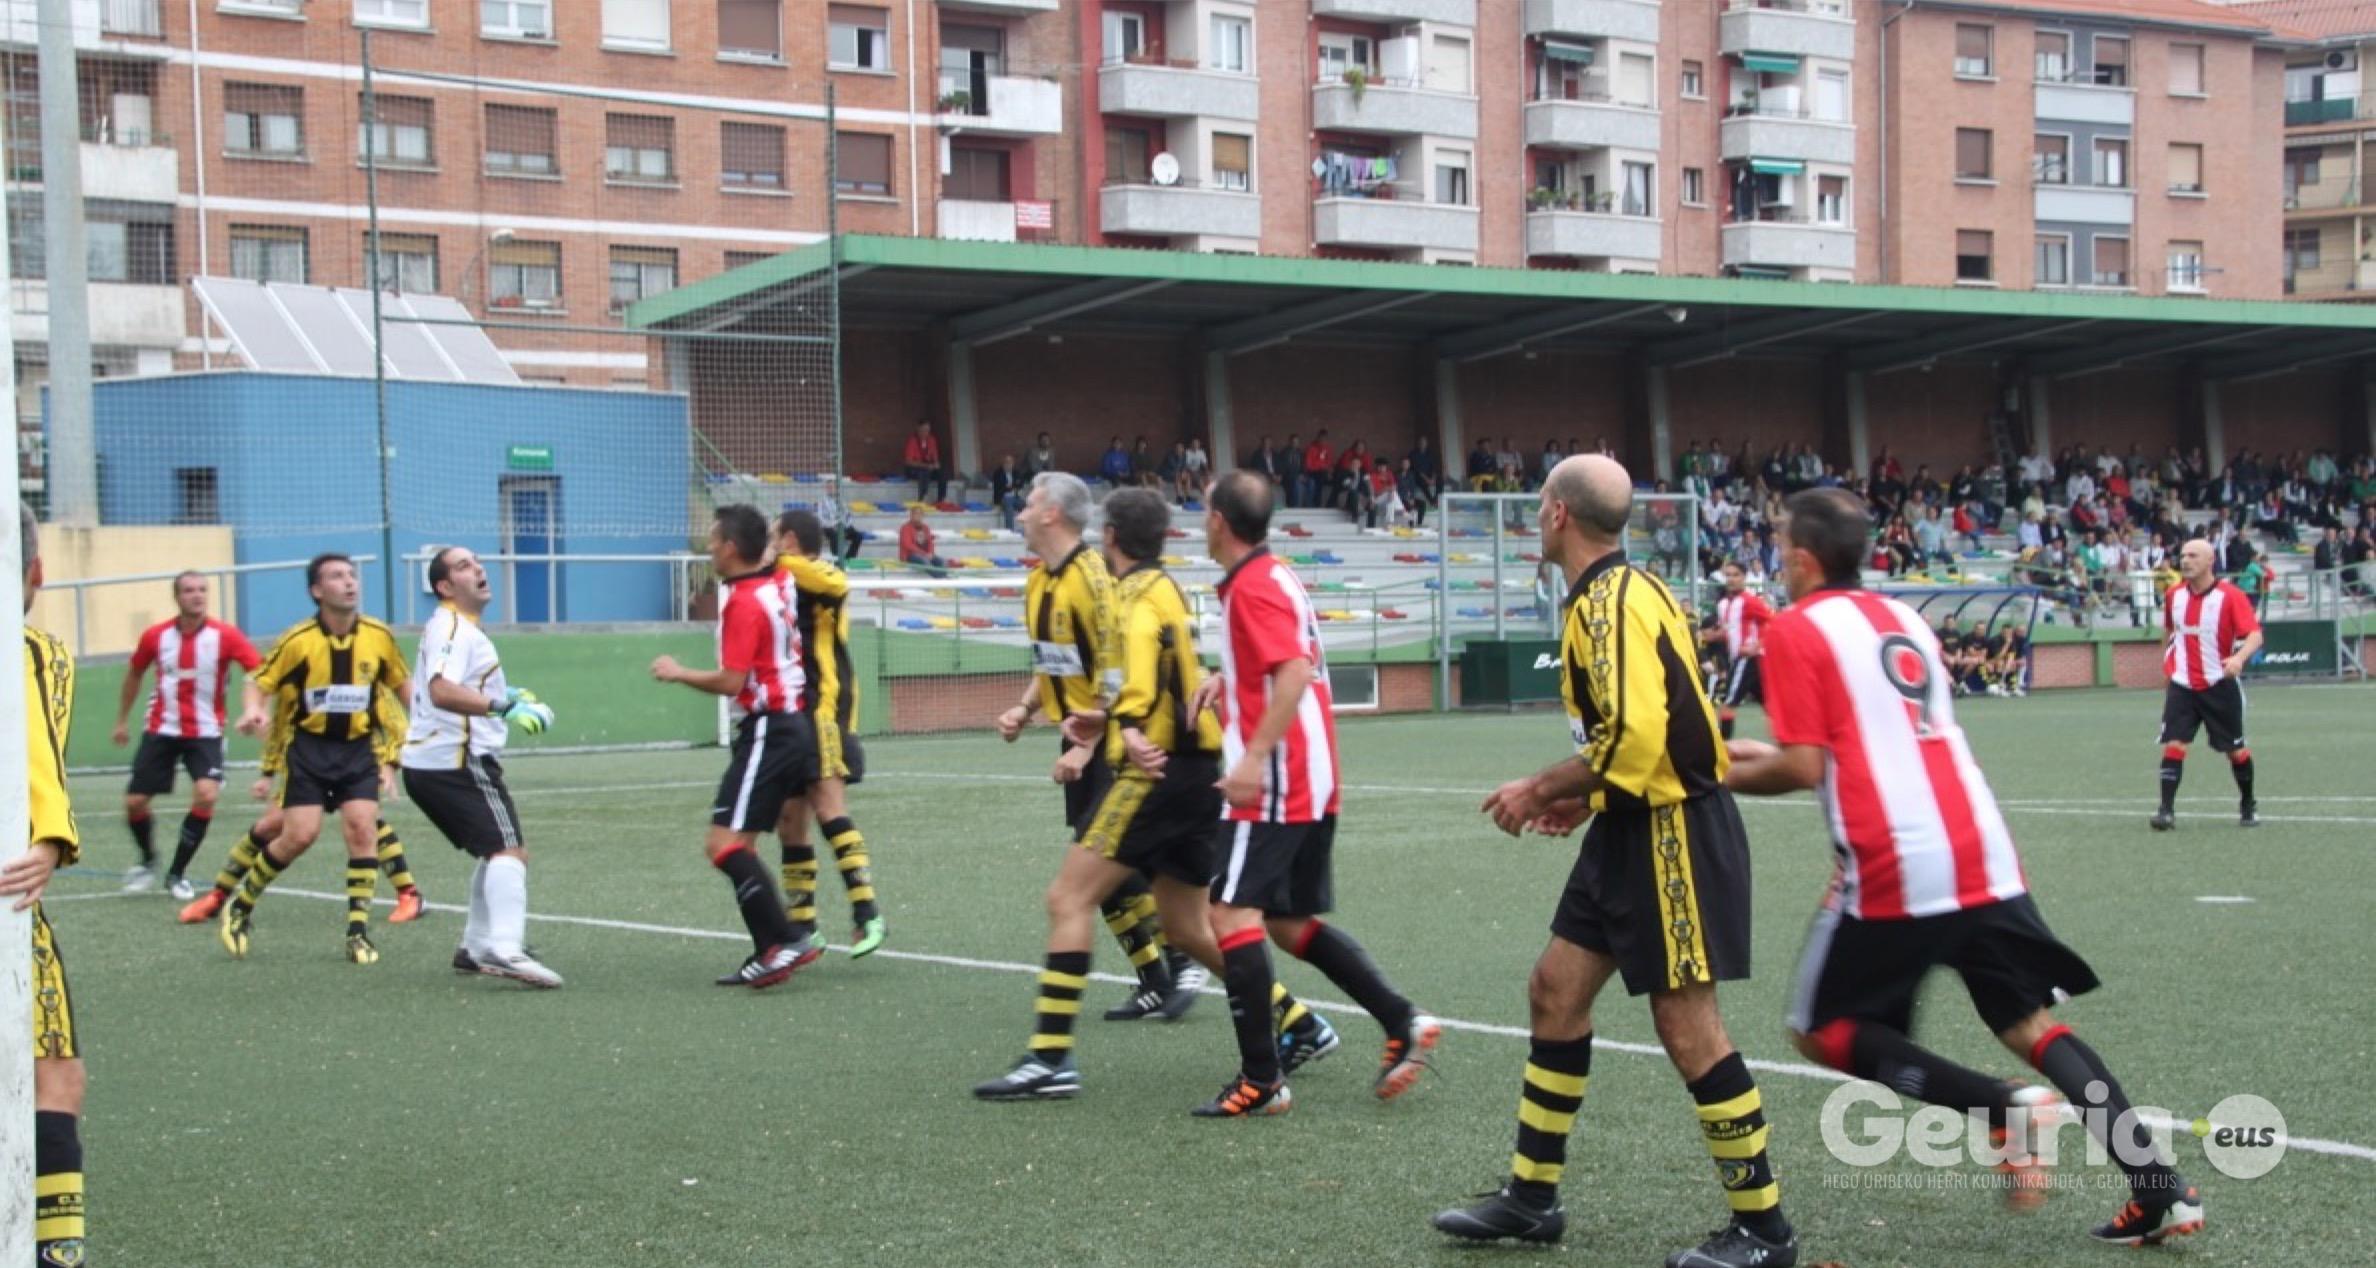 basauri_san_fausto_2015_futbol_basconia_beteranoak_6